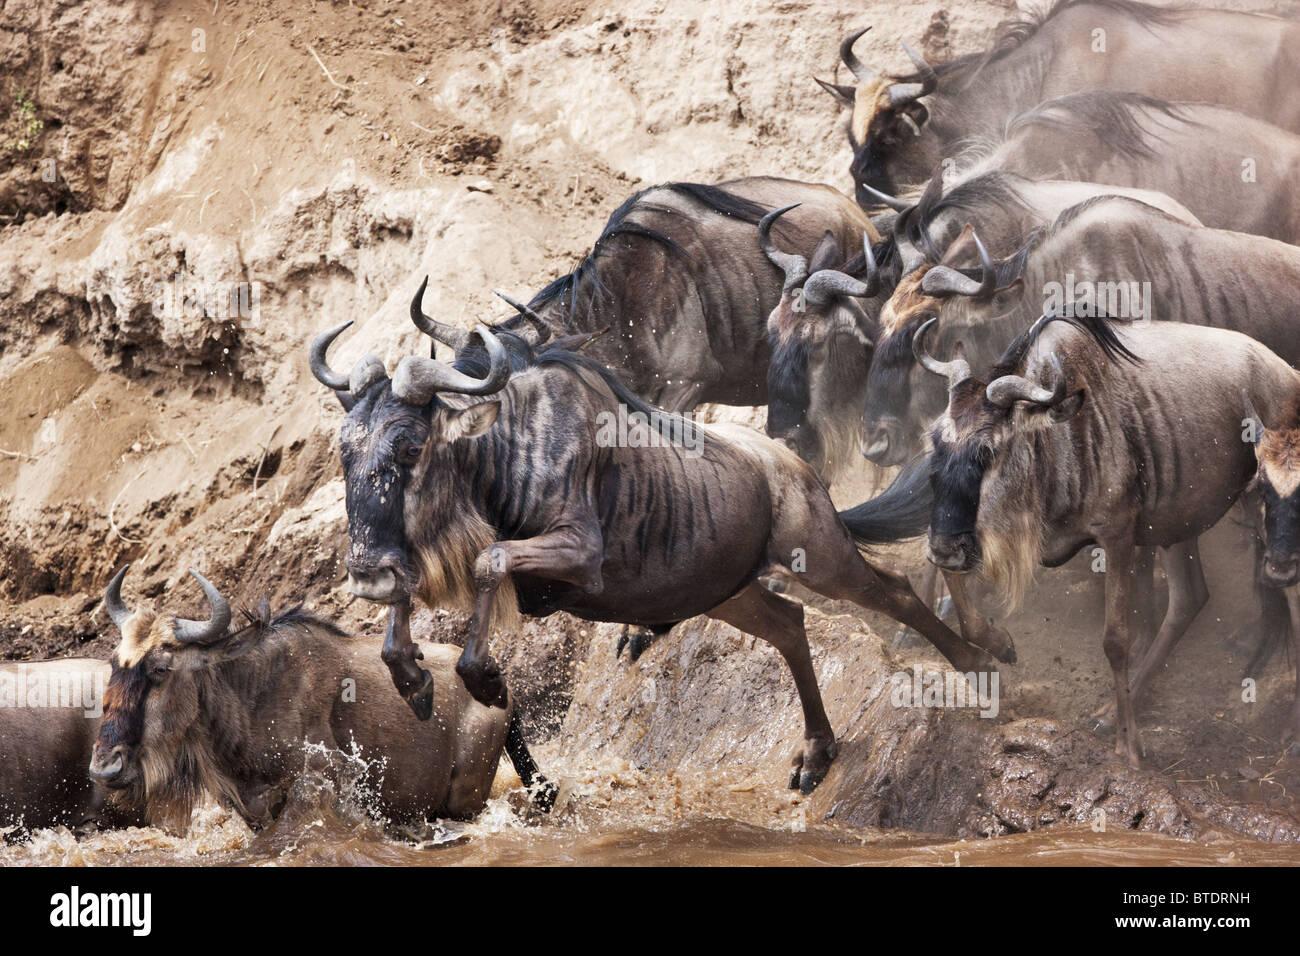 Wildebeest migration crossing the Mara River.Masai Mara National Reserve. Kenya - Stock Image